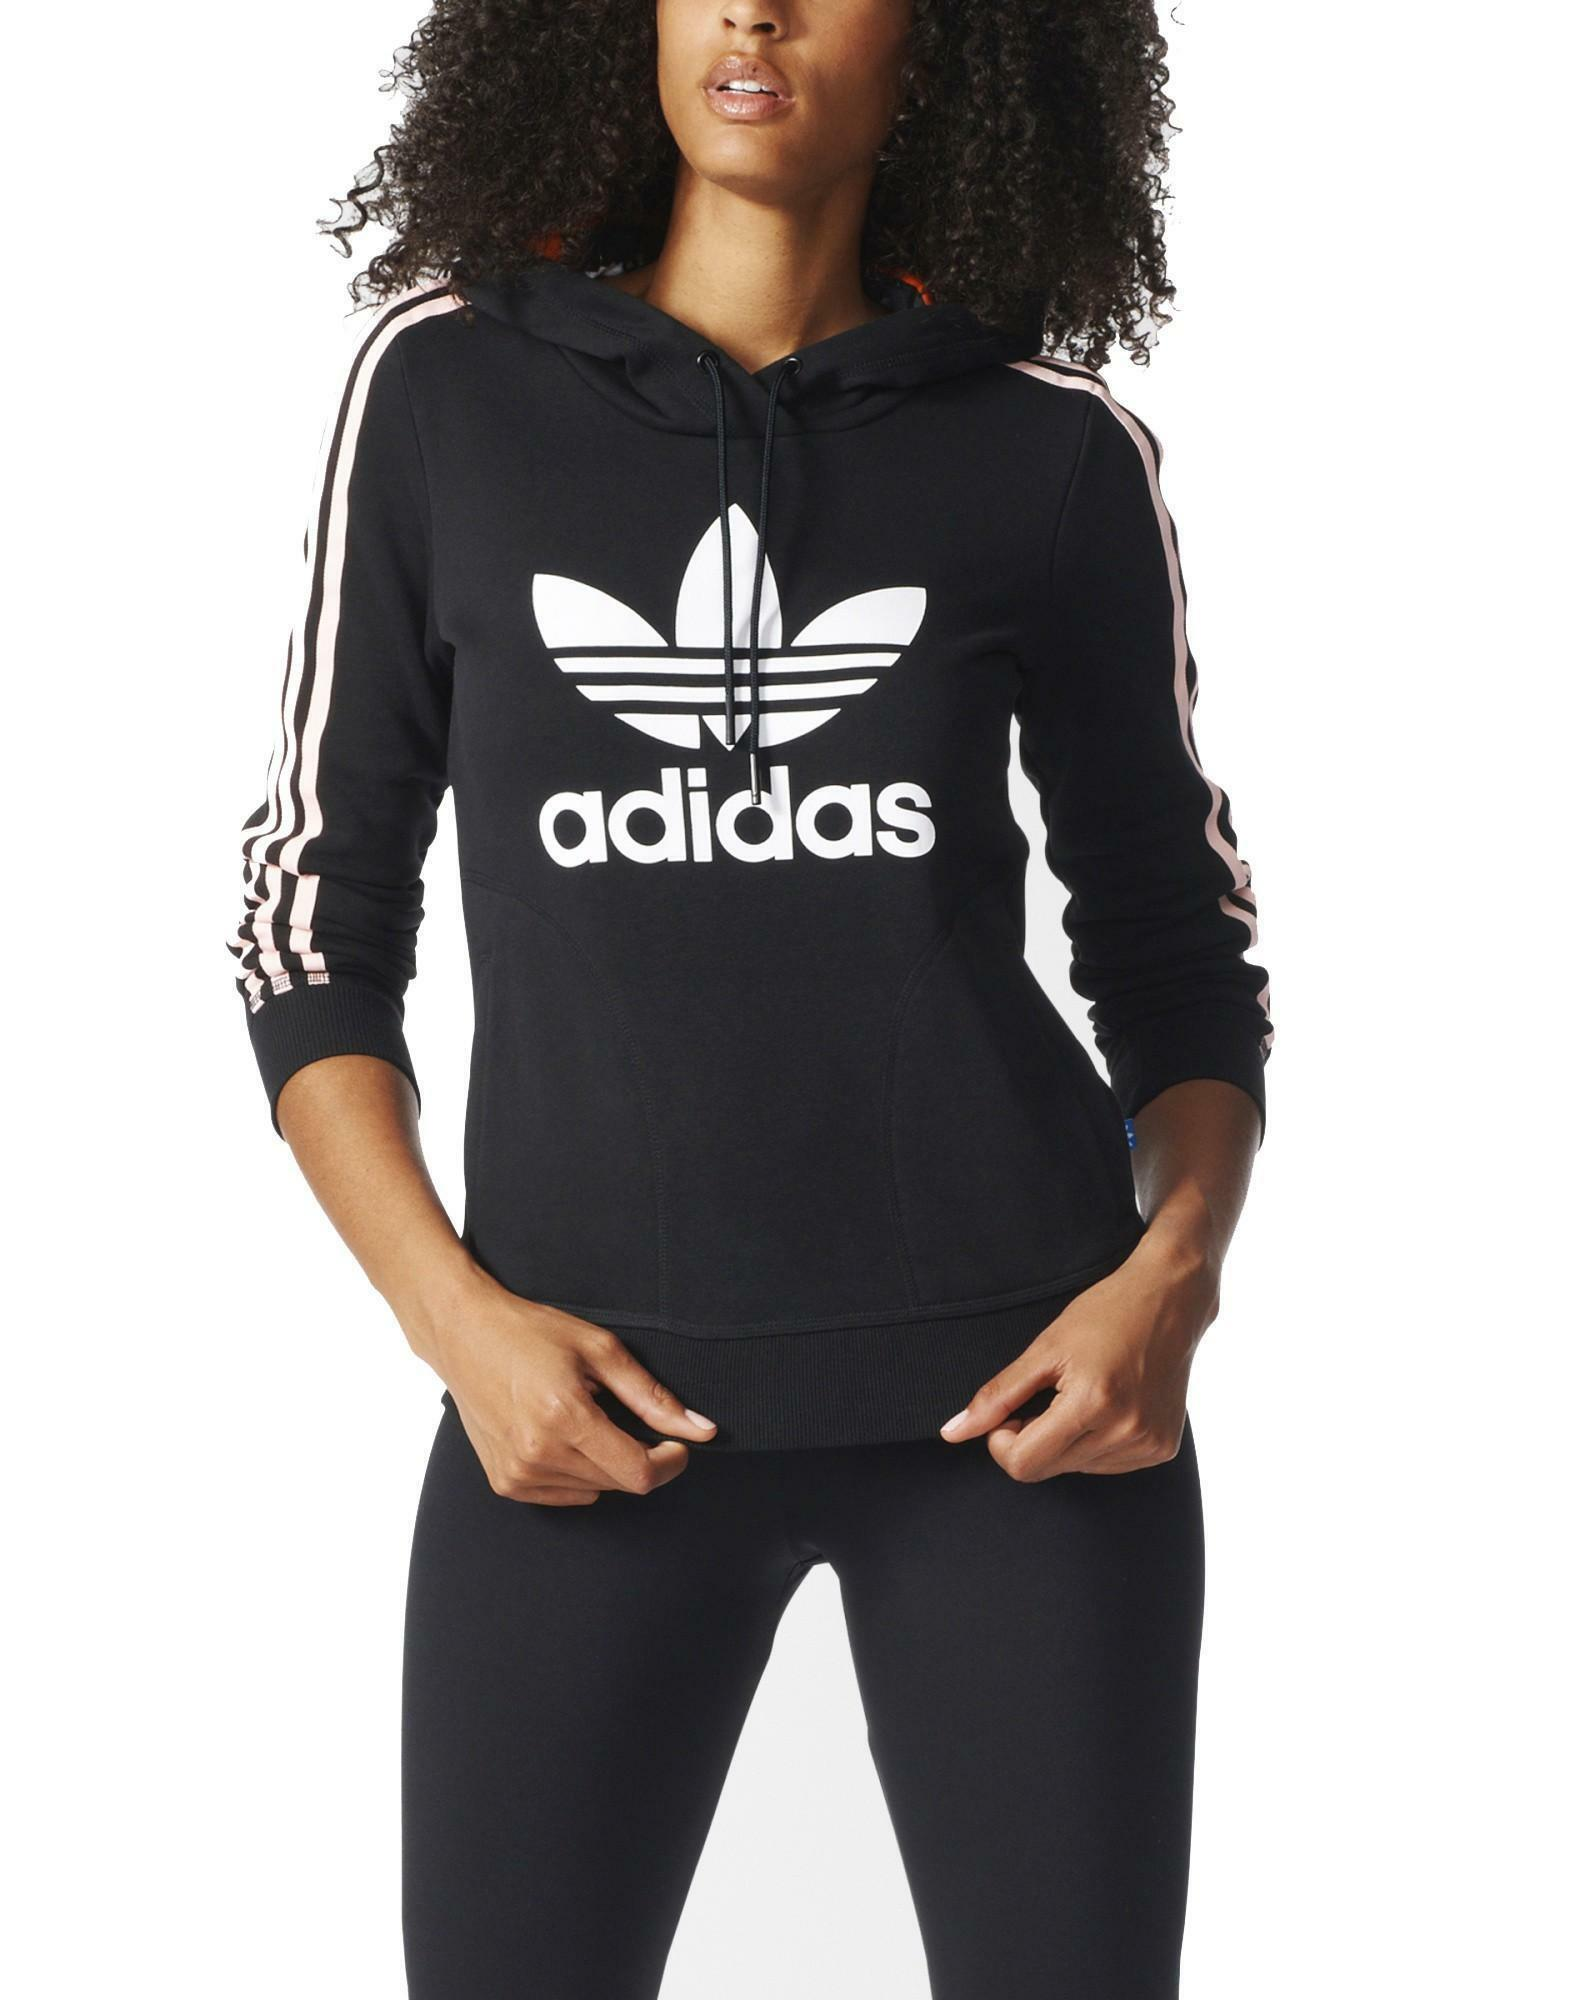 adidas adidas slim hoodie felpa donna nera